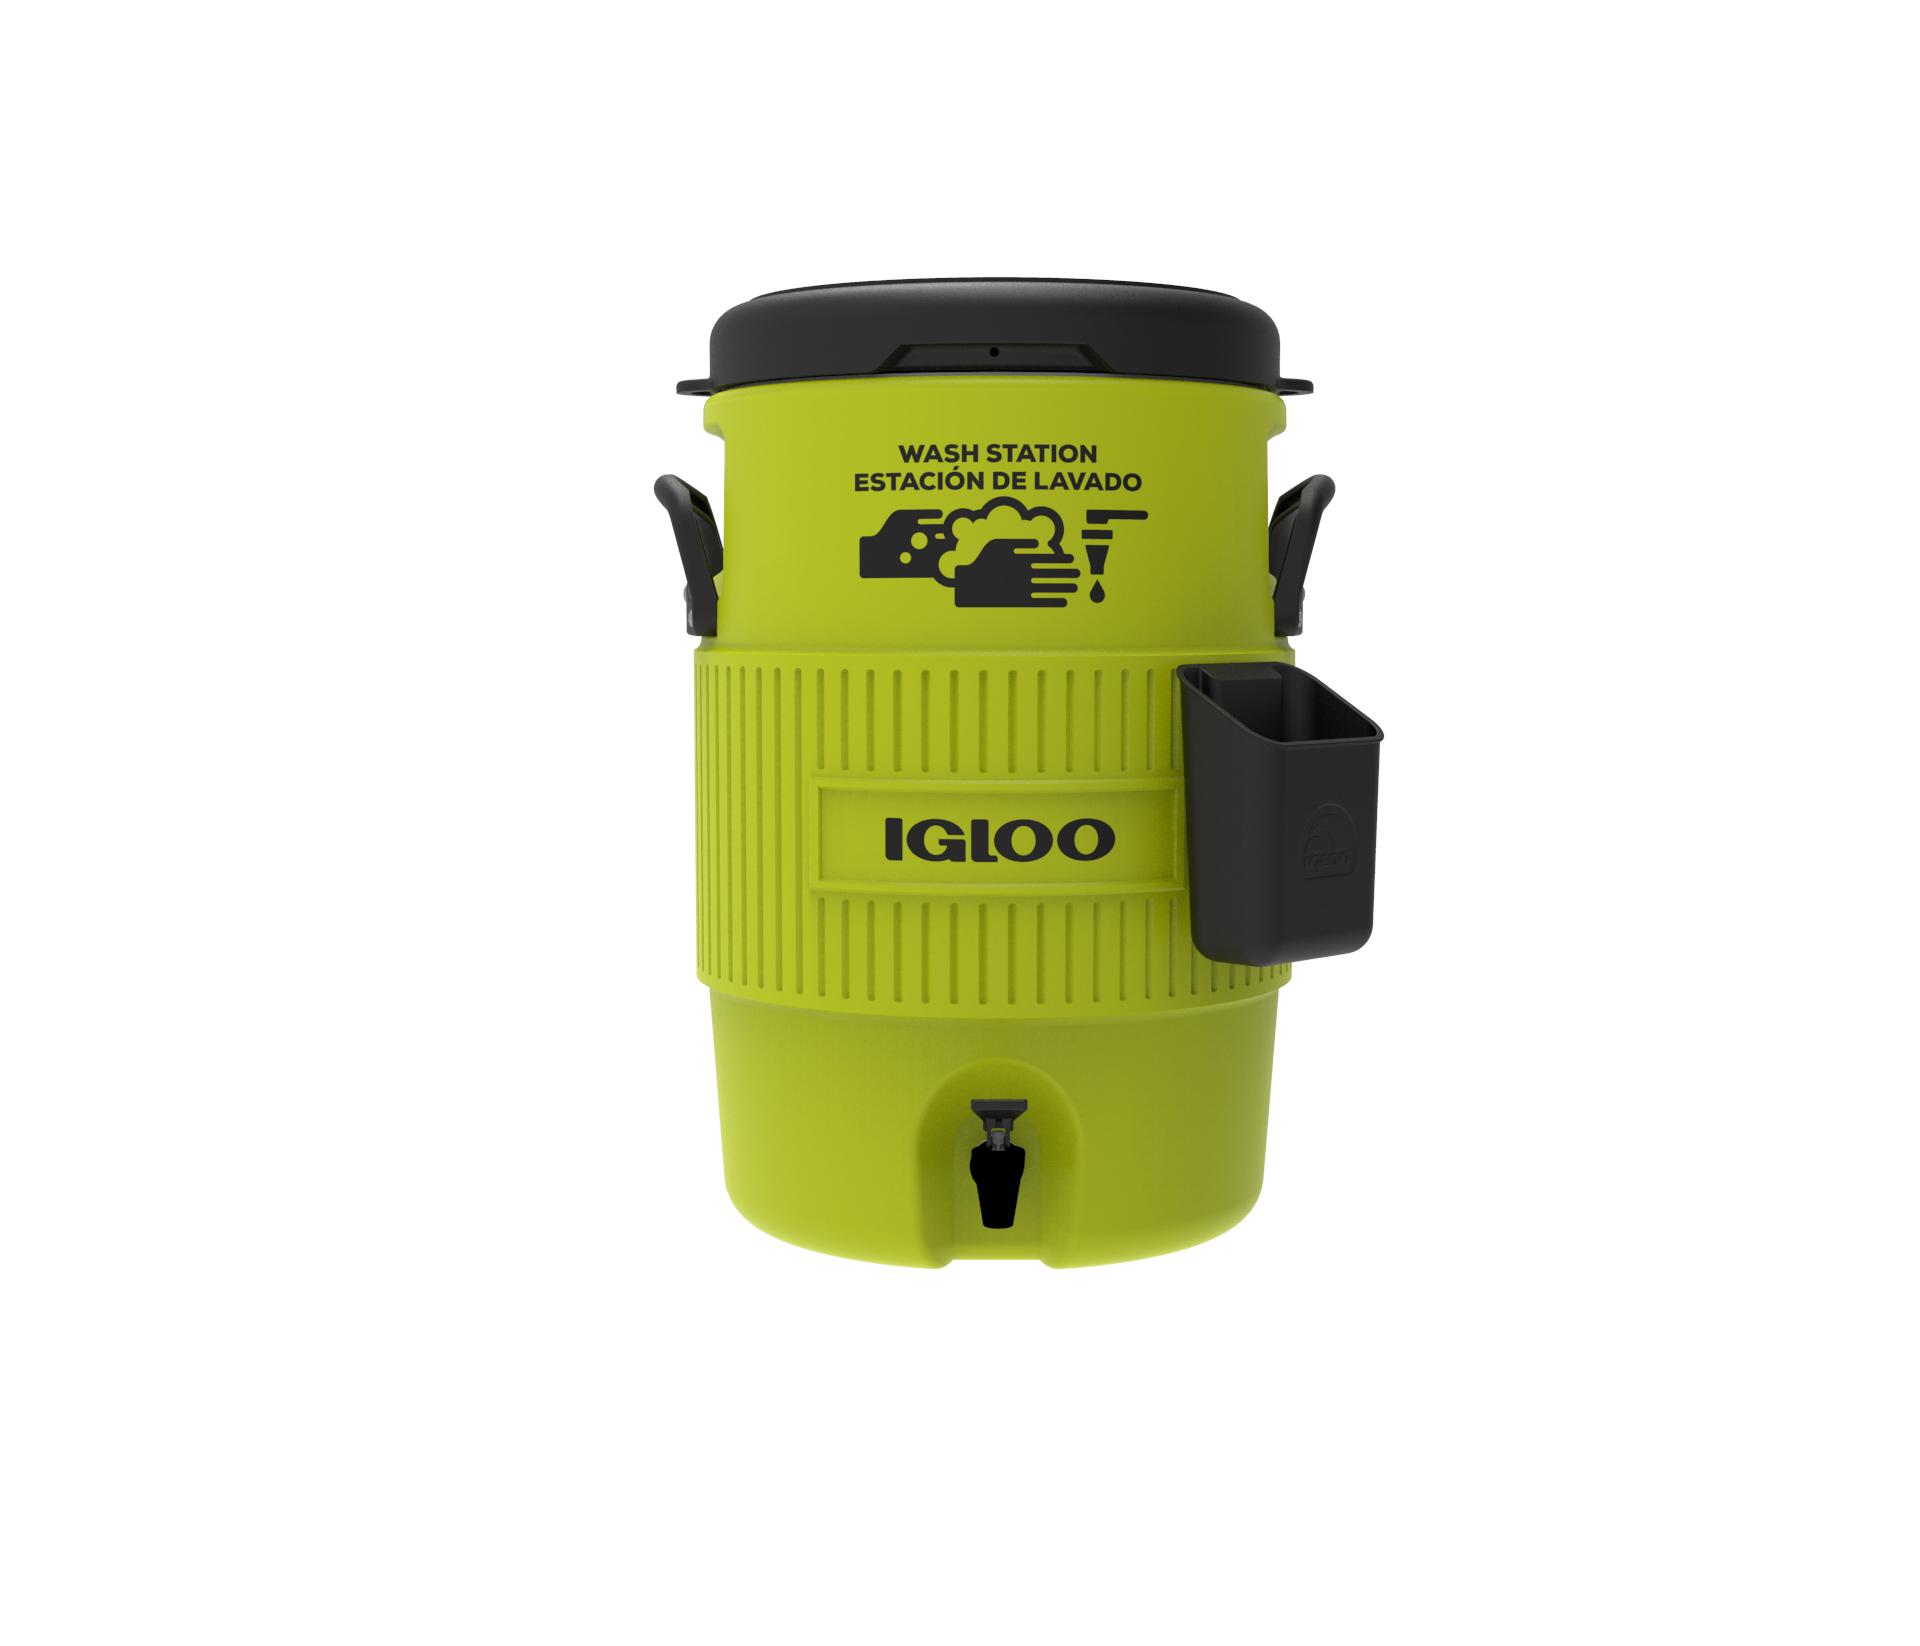 Igloo 42260 5 Gallon Hand Wash Station, Acid Green/Black